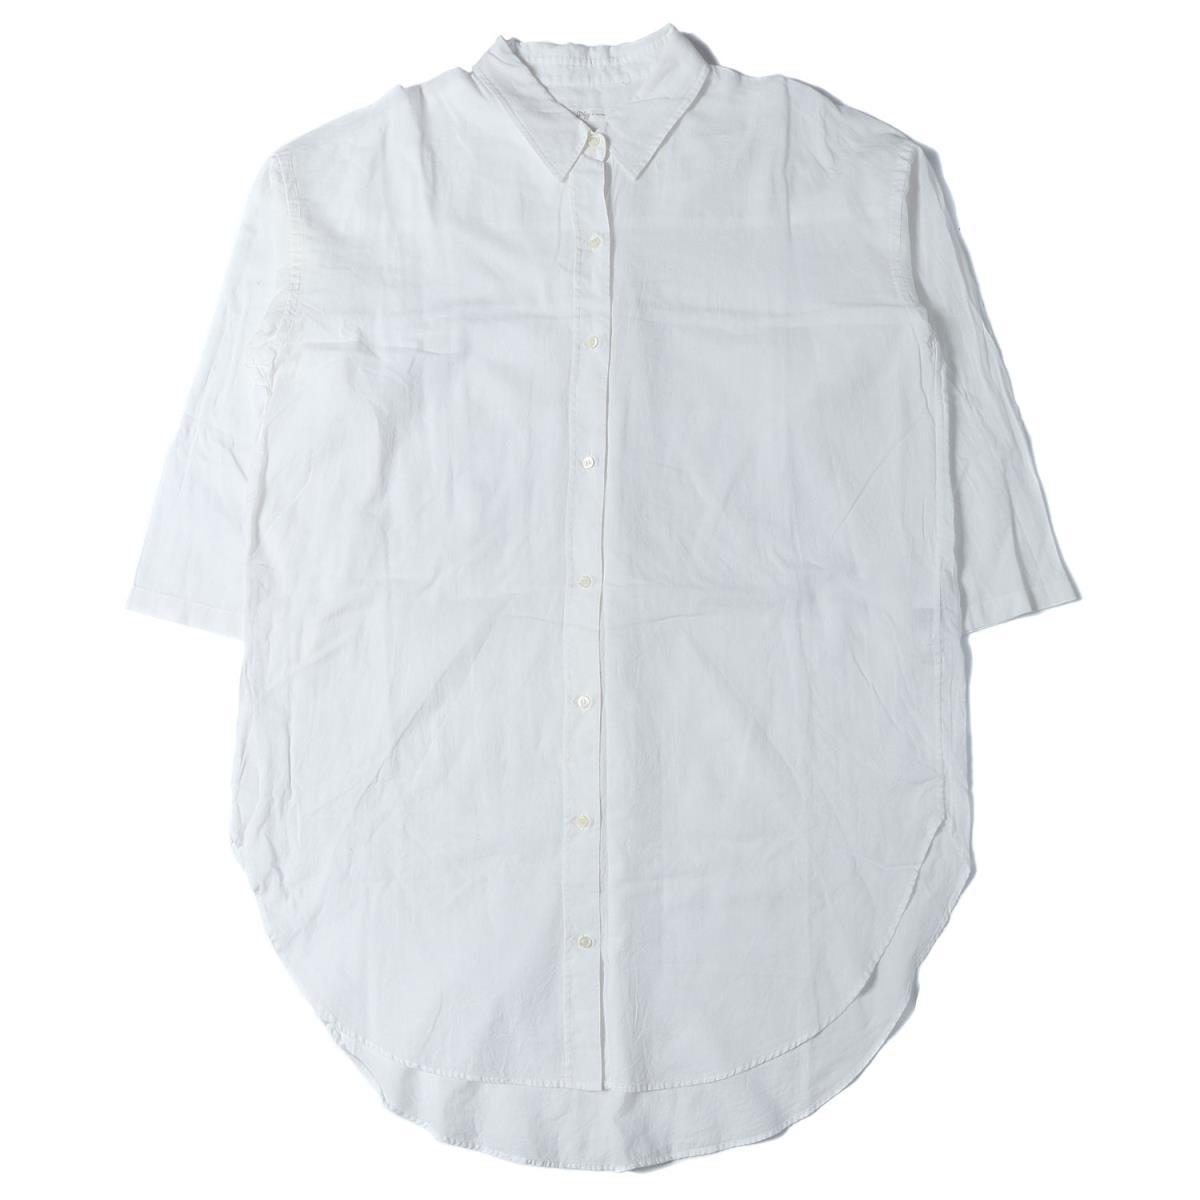 Plage プラージュ Stripe wash シャツ ワンピース 19春夏 ホワイト 【レディース】【中古】【K2552】